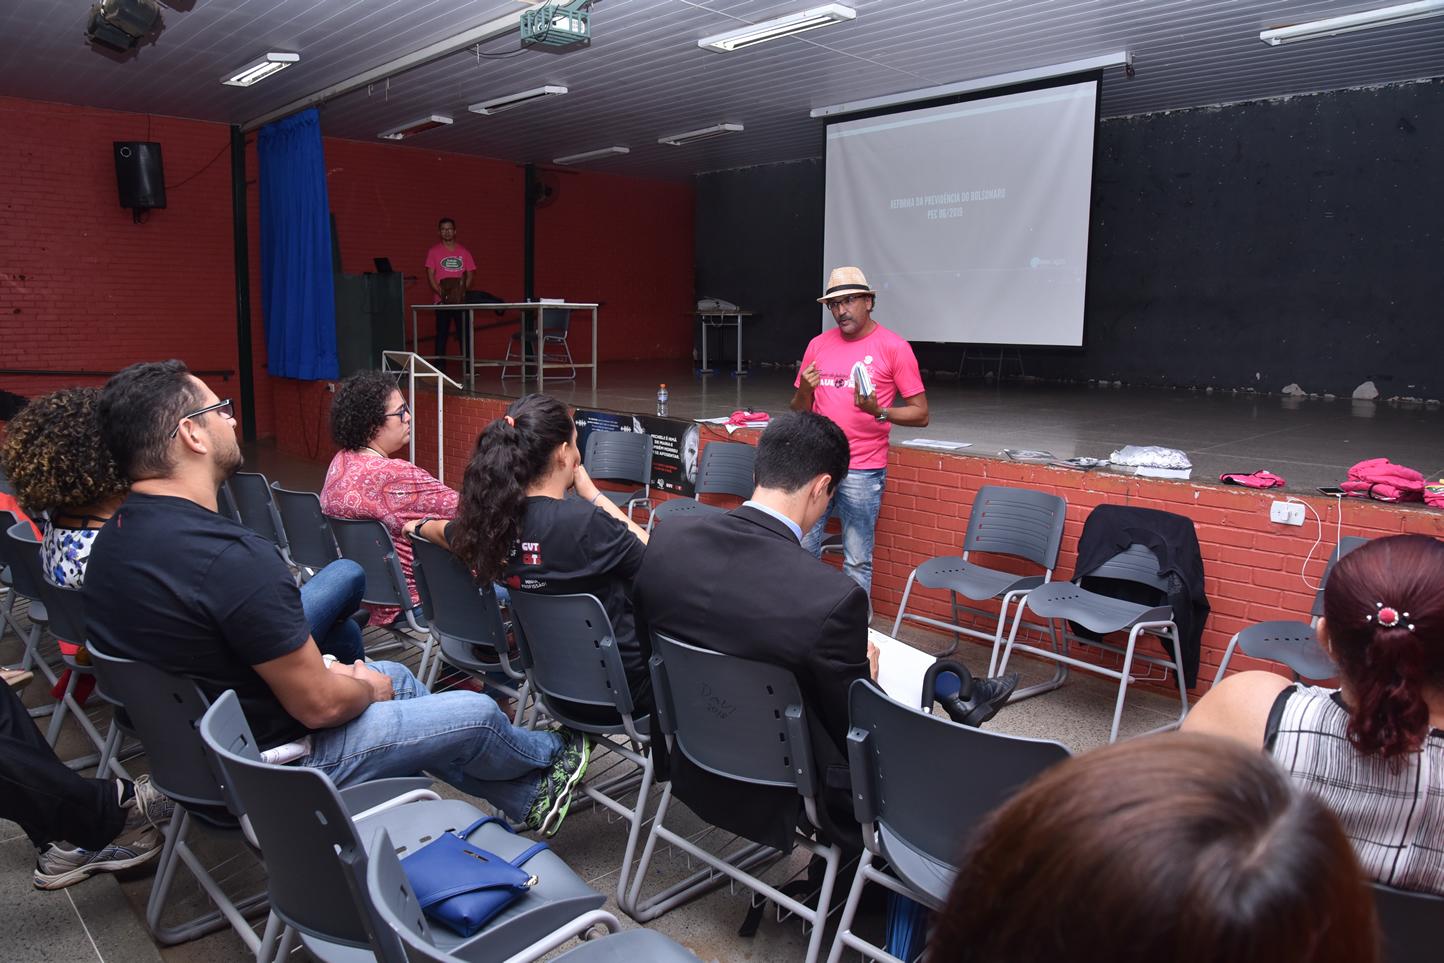 2019.04.11_Plenaria-de-Ceilandia_fotos-Joelma-Bomfim-18